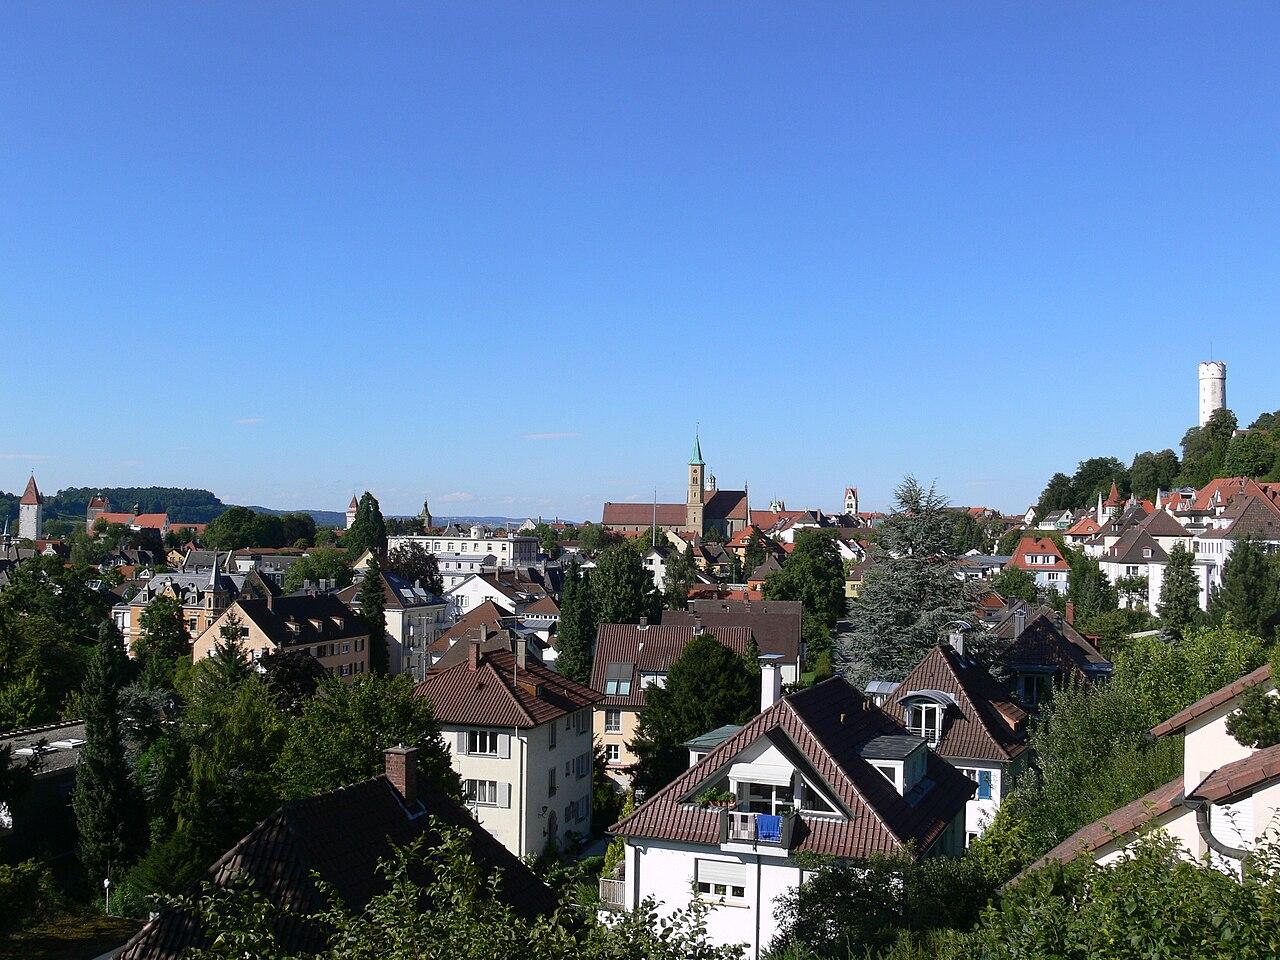 Ravensburg Blick von Federburgstraße.jpg